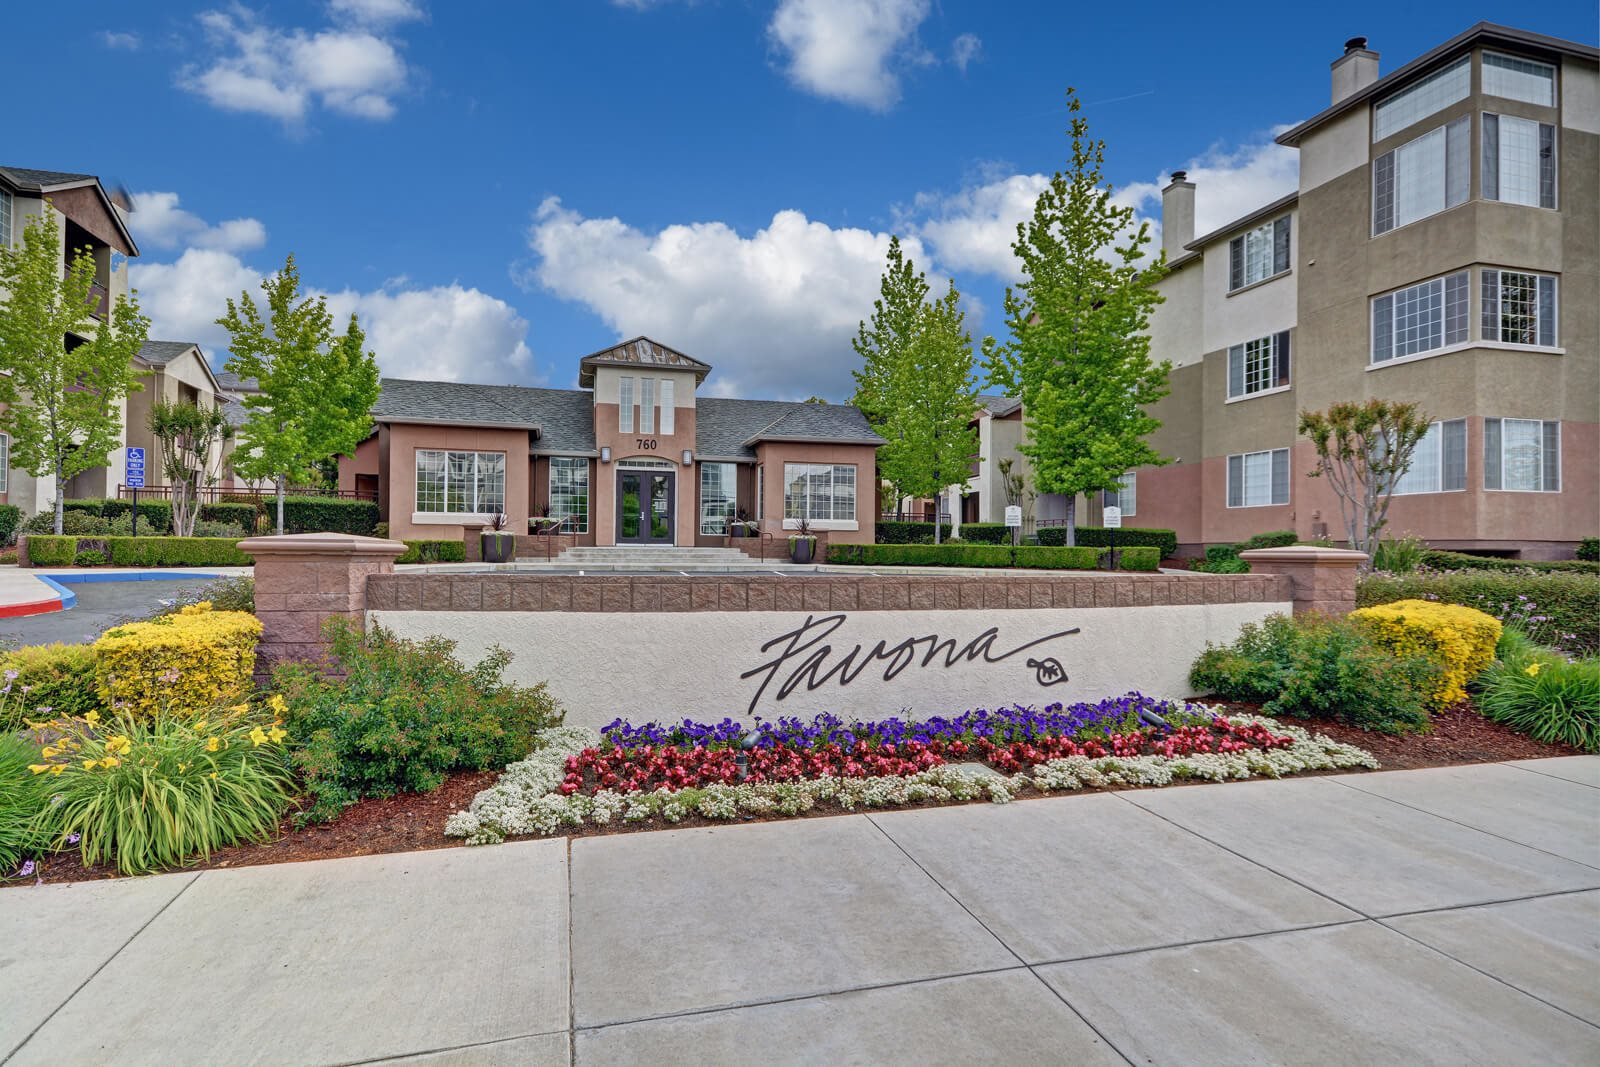 Welcoming Property Signage at Pavona Apartments, 760 N. 7th Street, San Jose